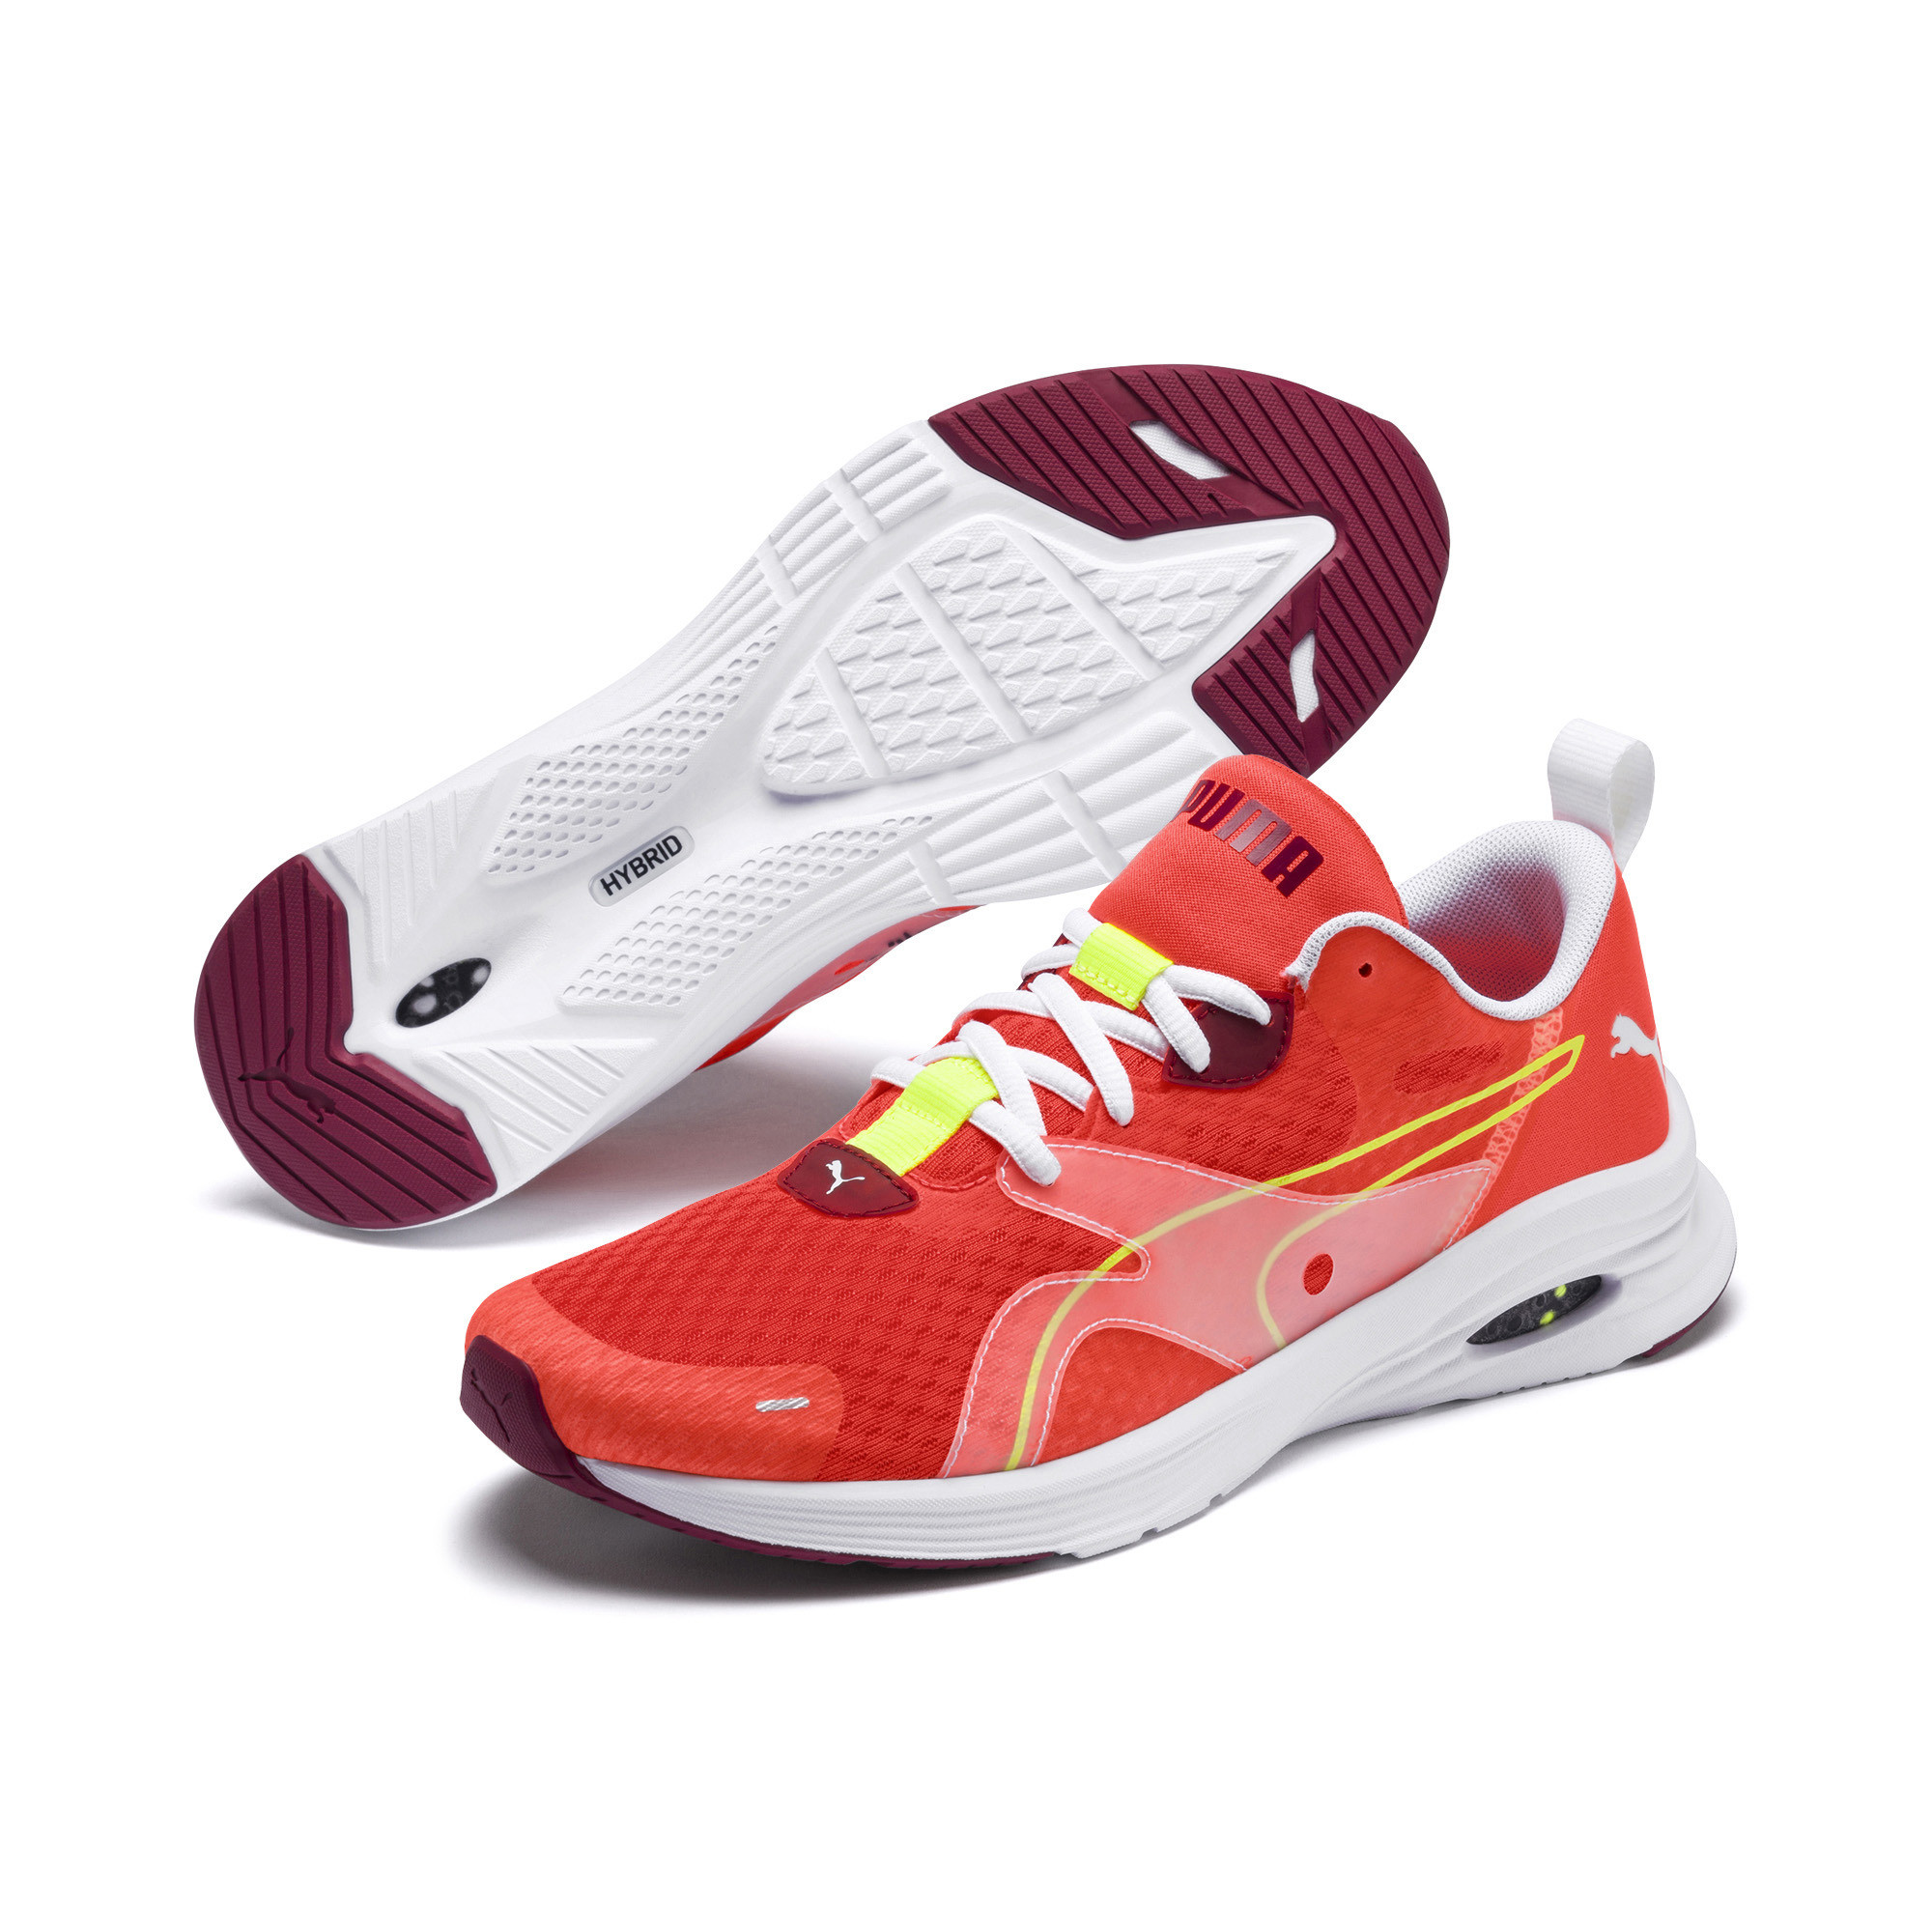 Details zu PUMA HYBRID Fuego Running Sneaker Männer Schuhe Laufen Neu